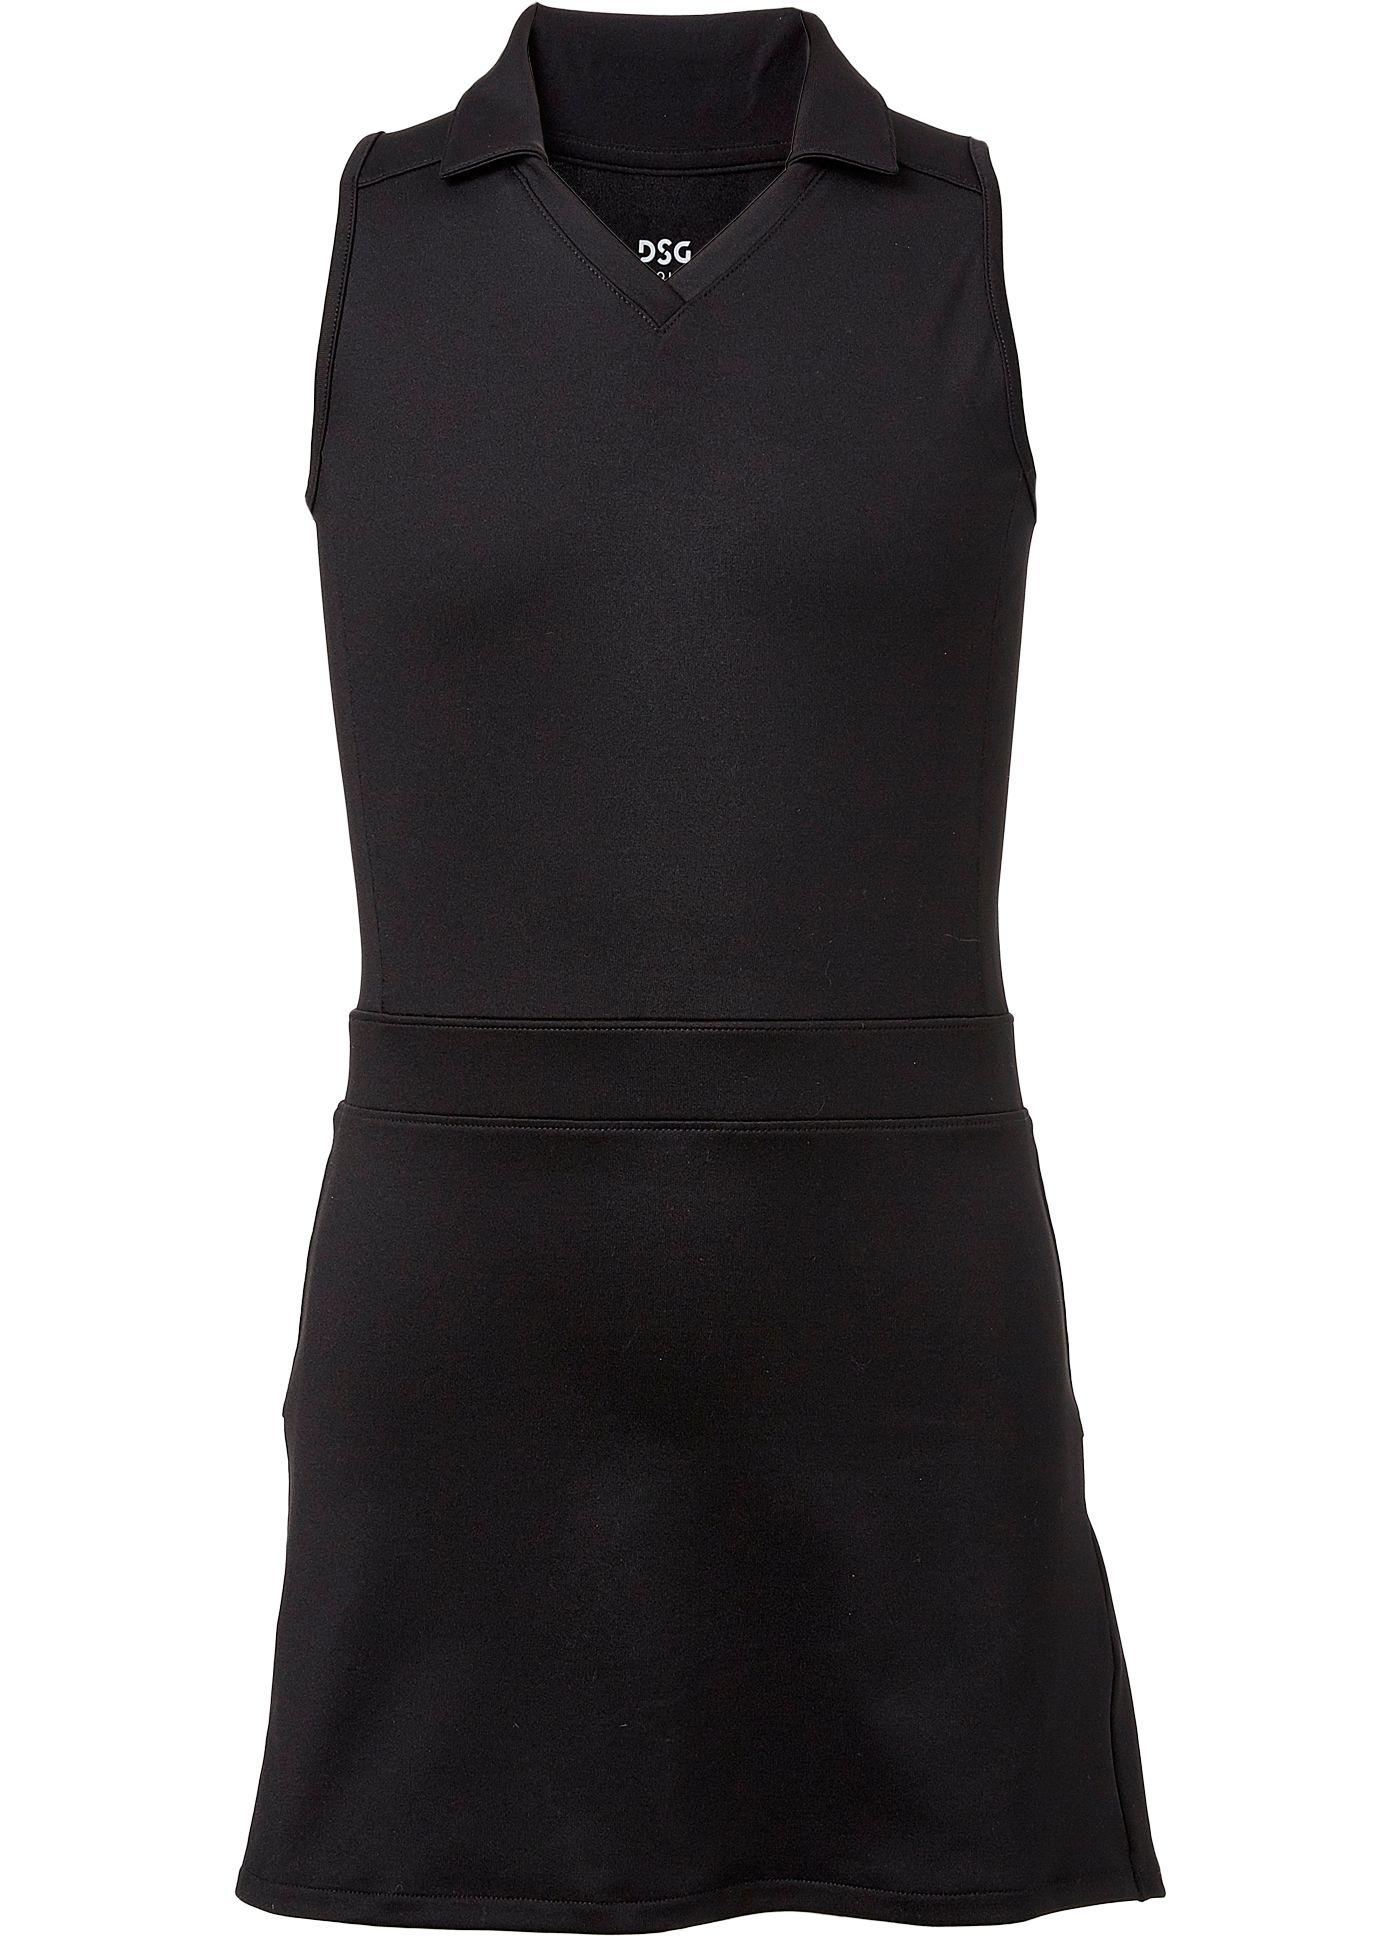 DSG Girls' Pleated Back Golf Dress